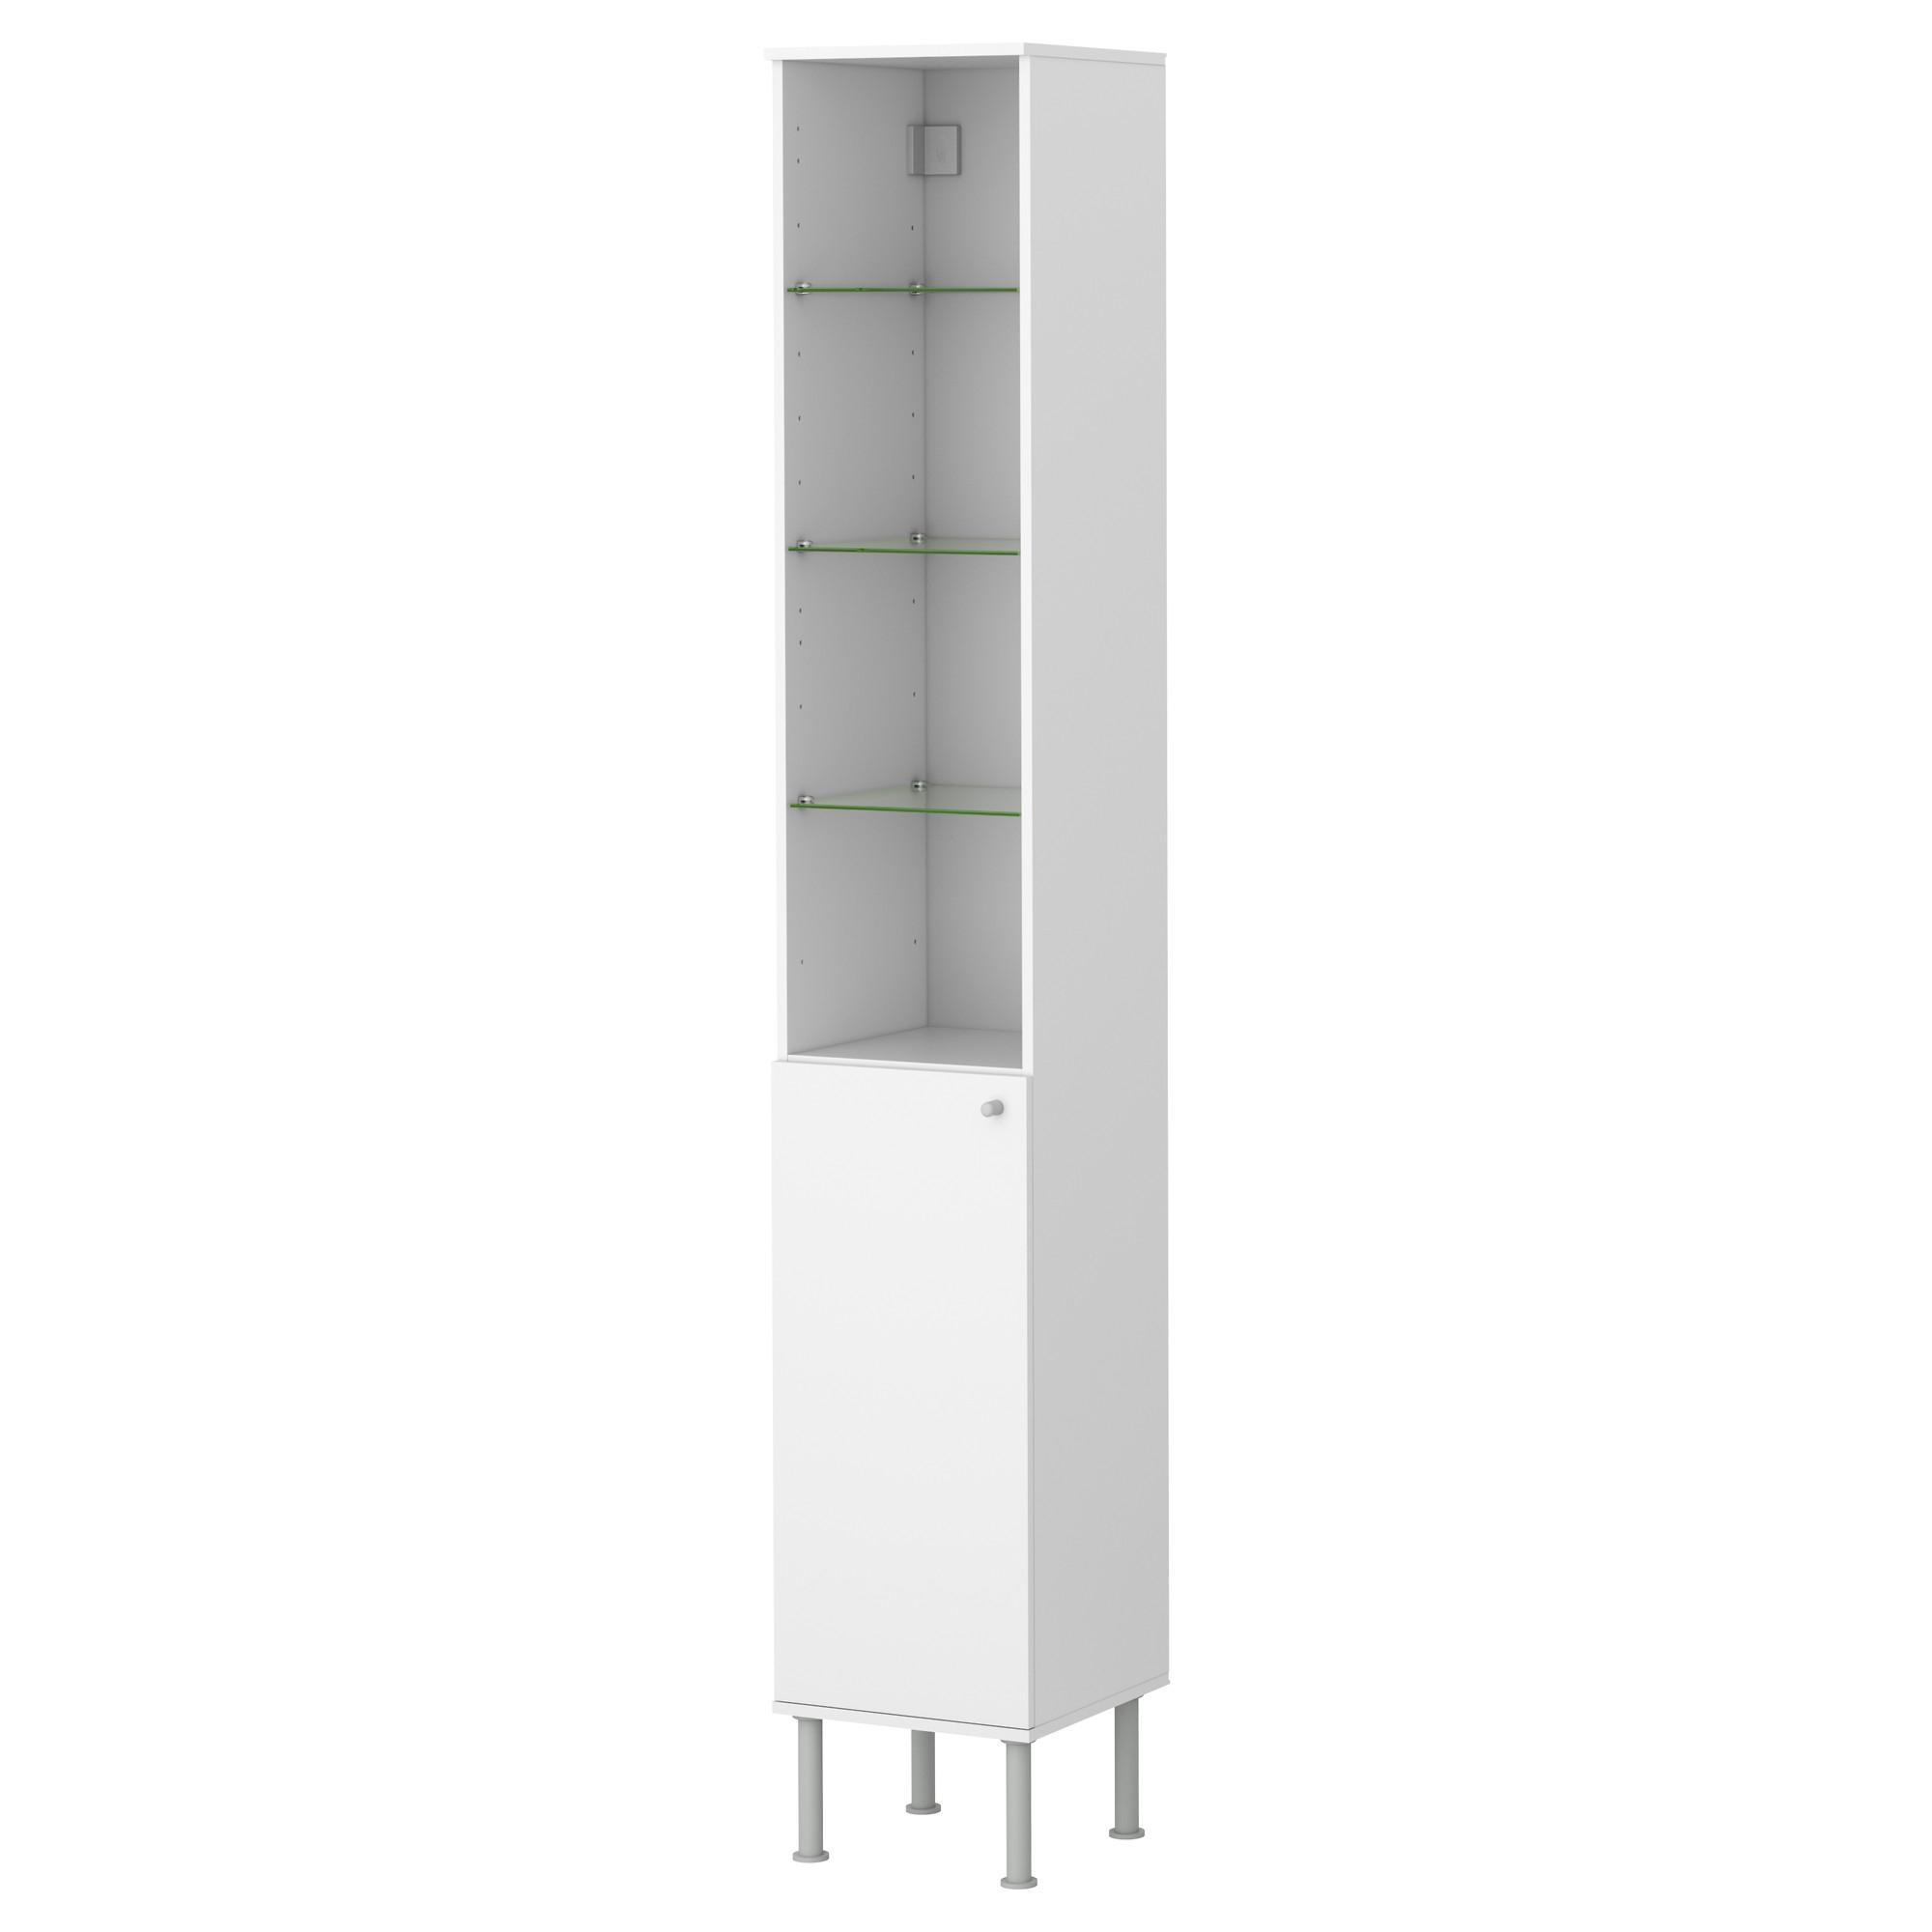 Baños > Muebles De Baño > Muebles De Baño #627556 2000 2000 Mobiletti X Cucina Ikea